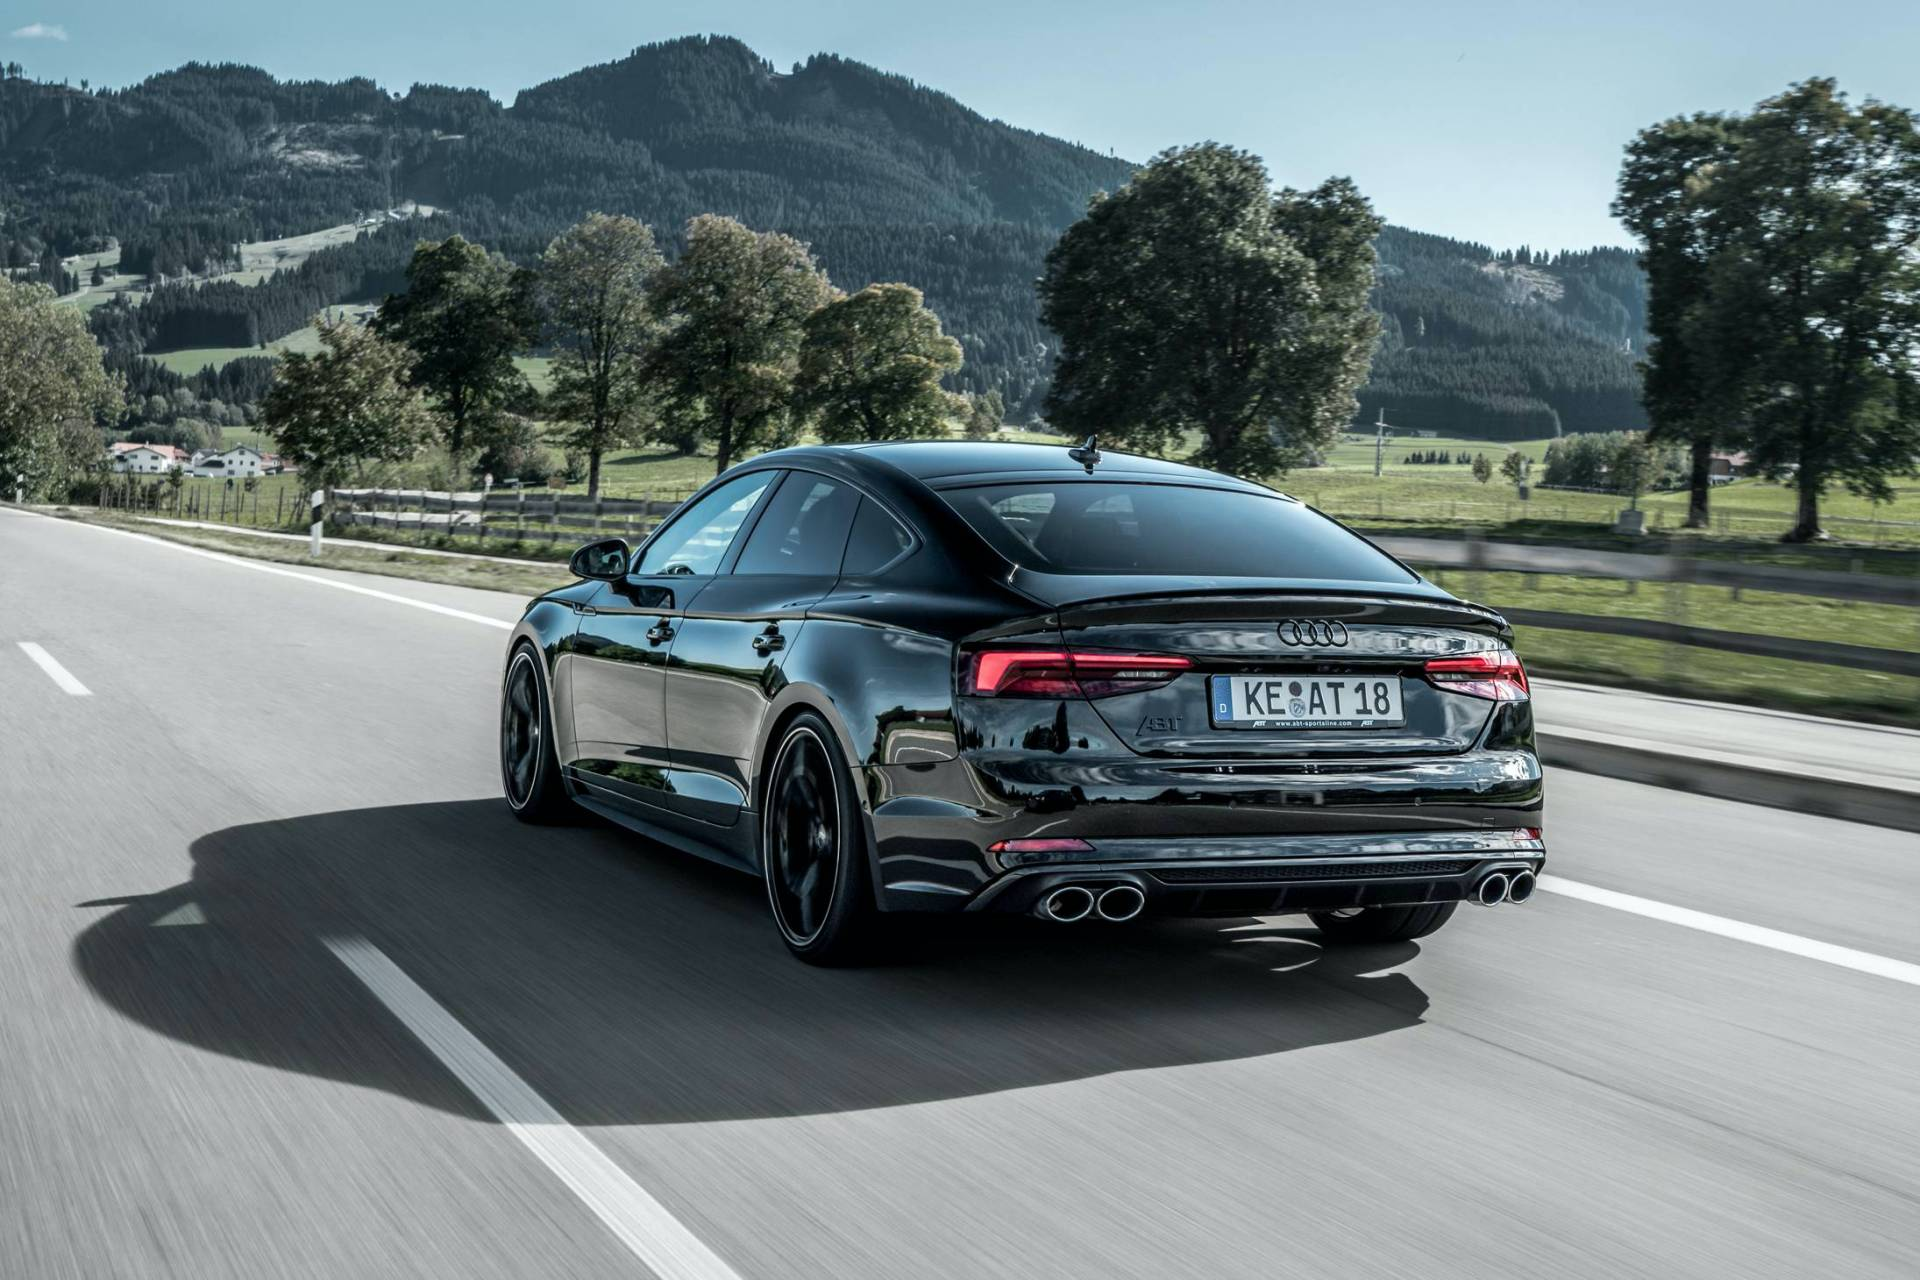 Audi-S5-Sportback-TDI-by-ABT-Sportsline-9